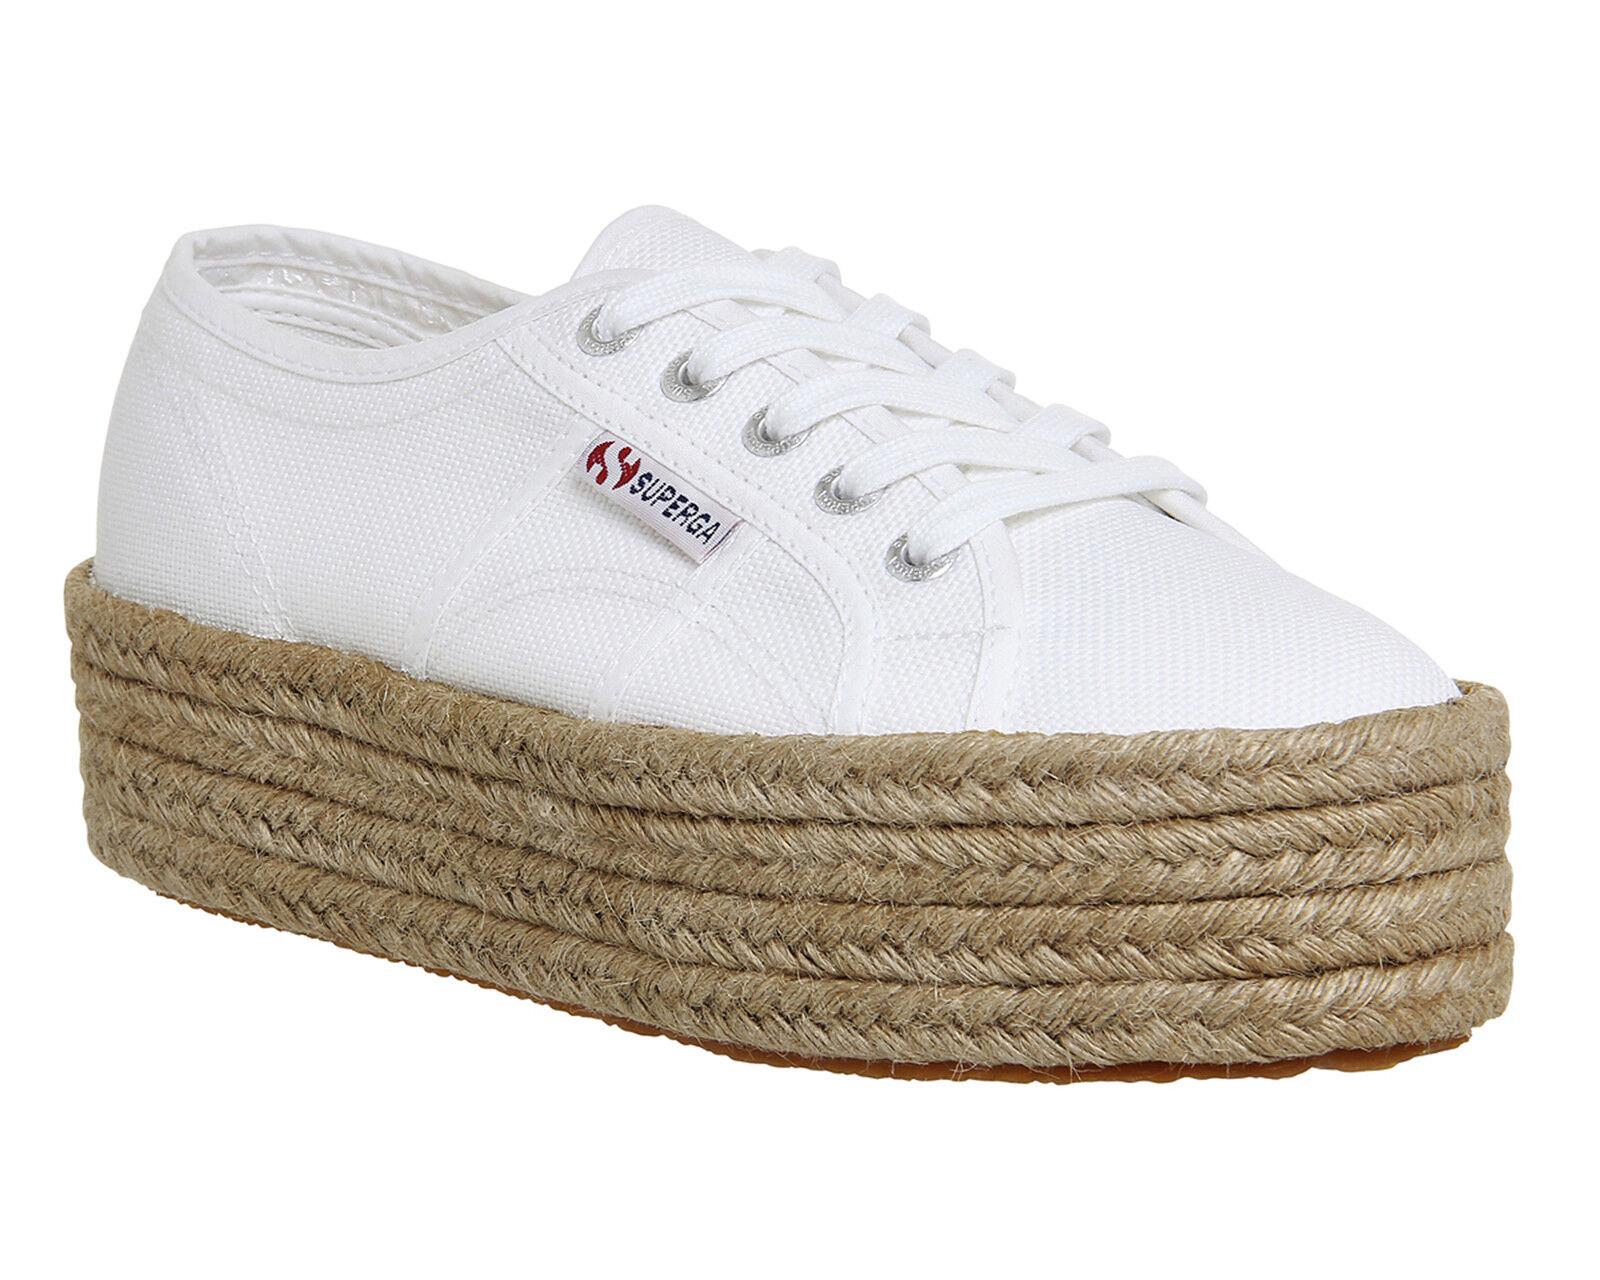 Da Donna Superga 2790 Scarpe da ginnastica ginnastica ginnastica bianca Espadrillas | Uscita  | Scolaro/Ragazze Scarpa  863db7